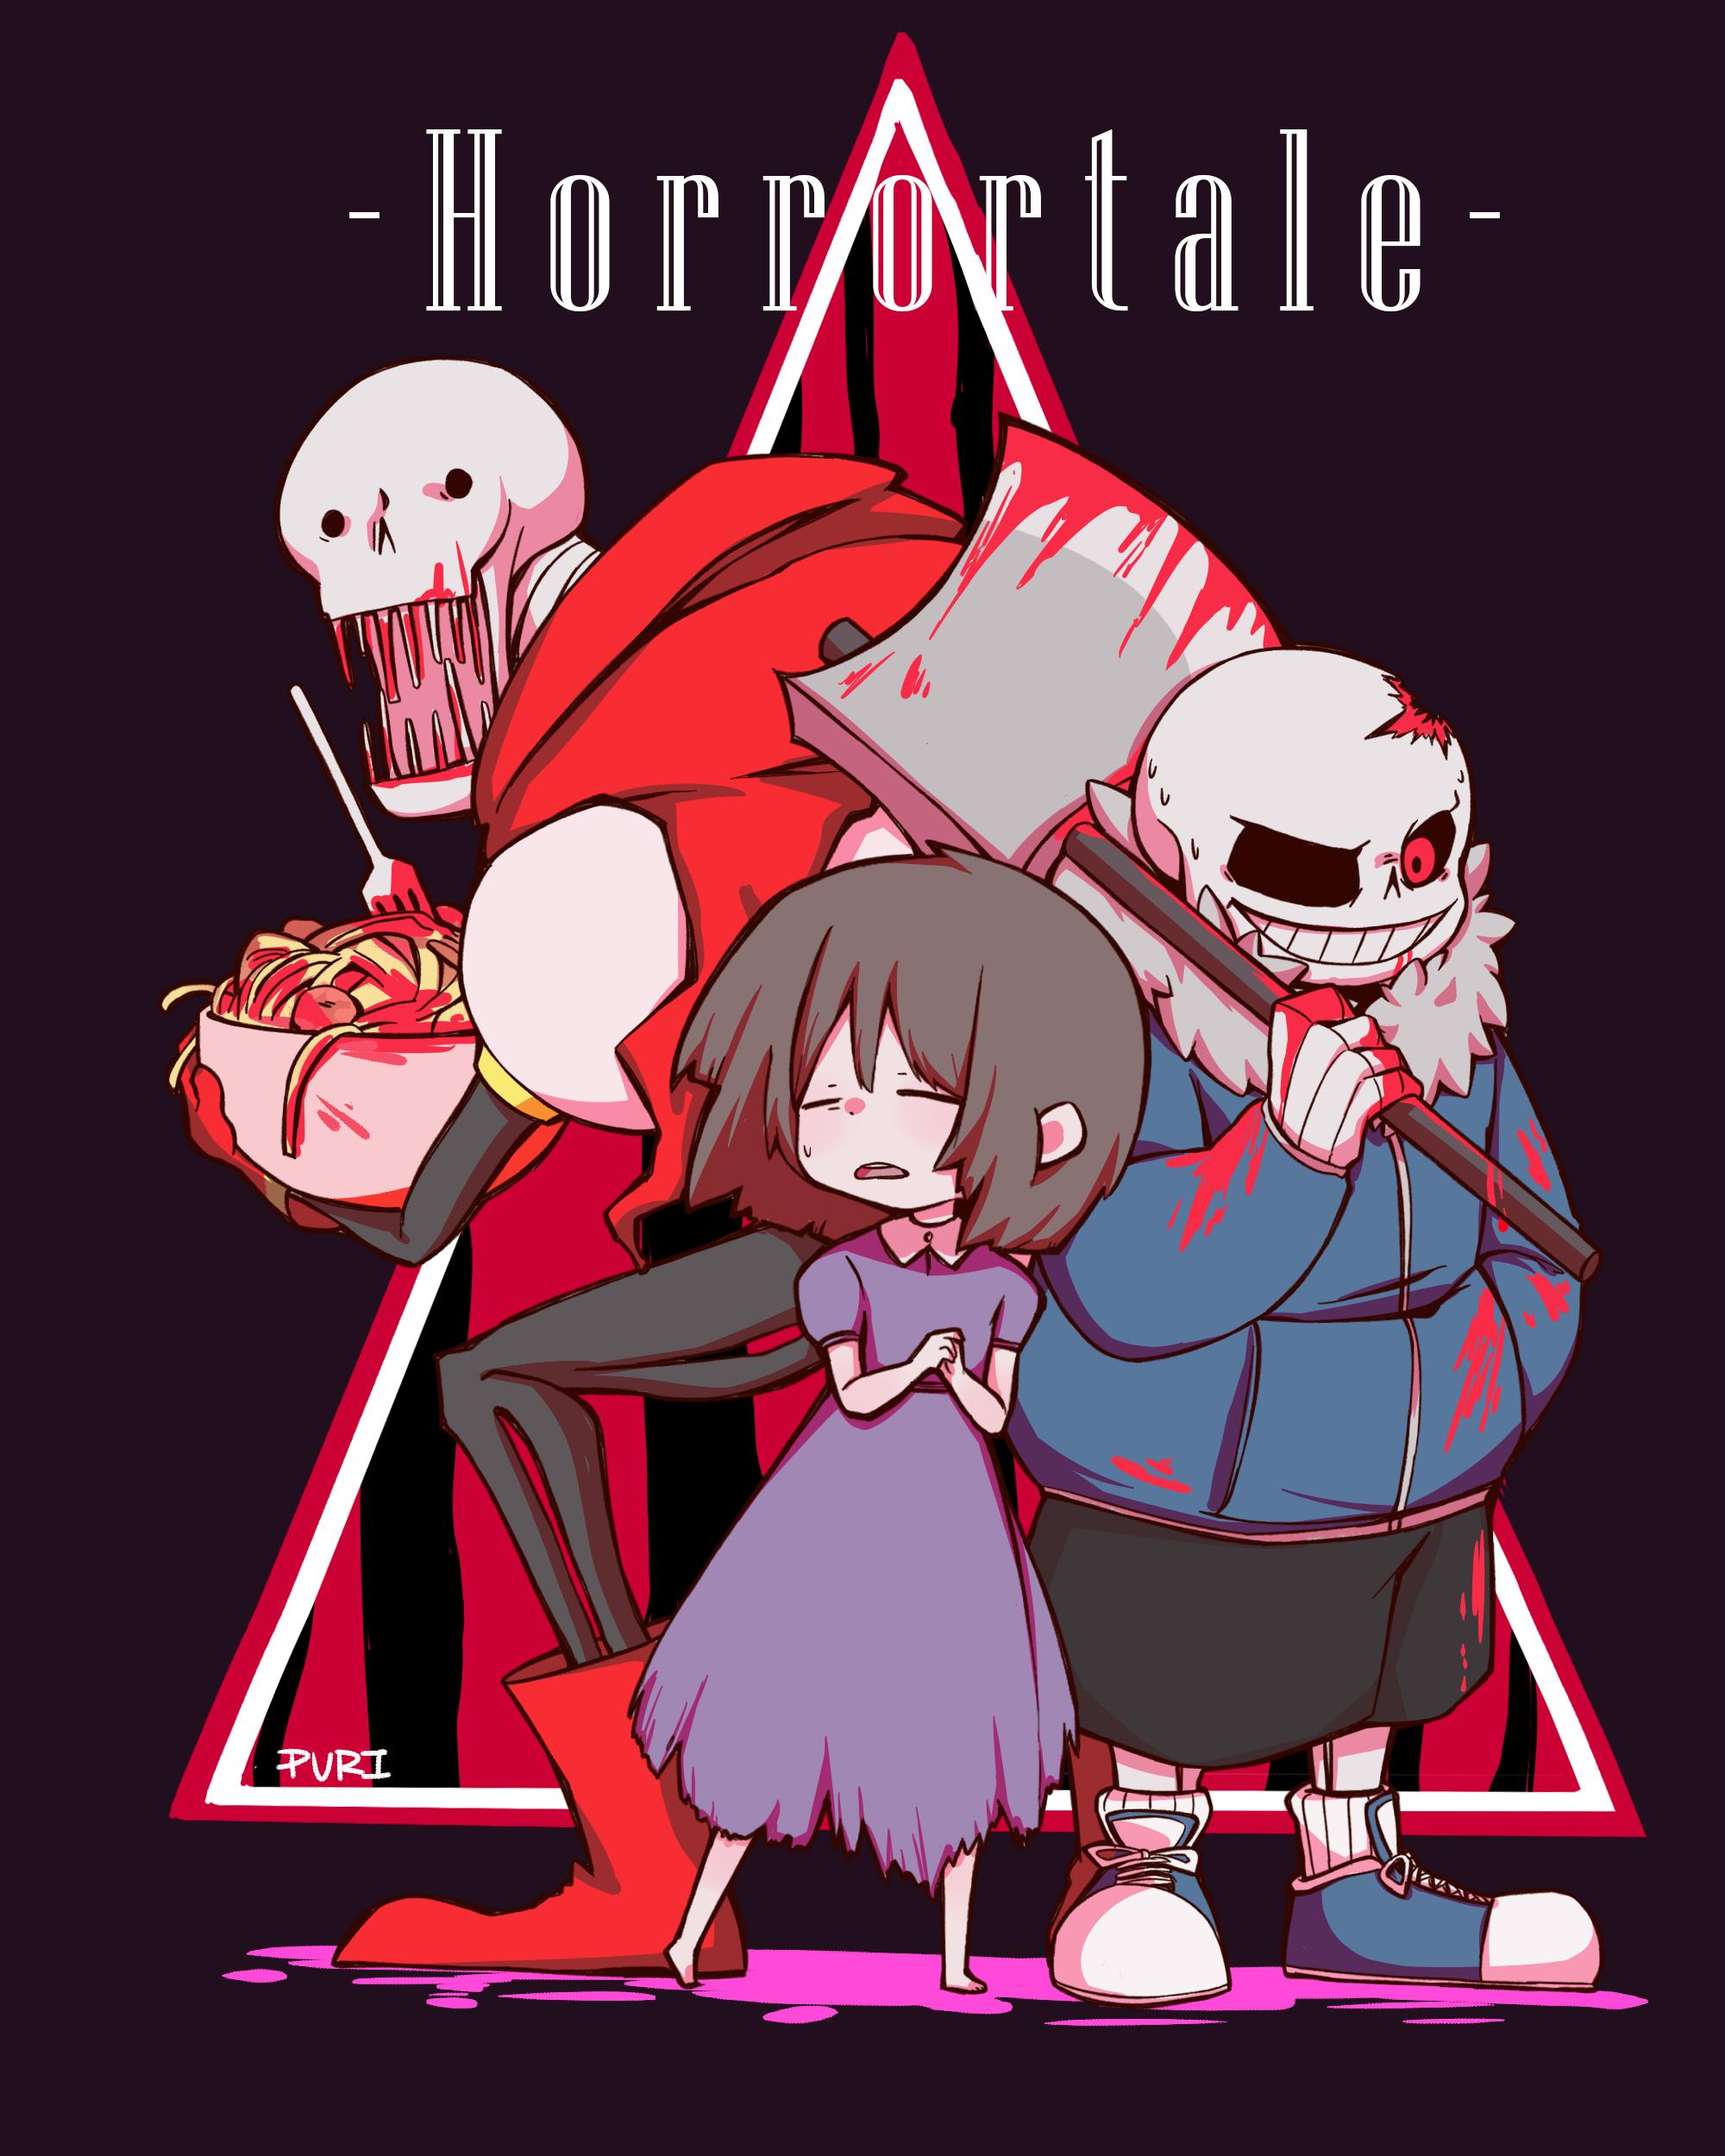 Horrrortale Papyrus Aliza E Horror Sans Horror Sans Horrortale Undertale